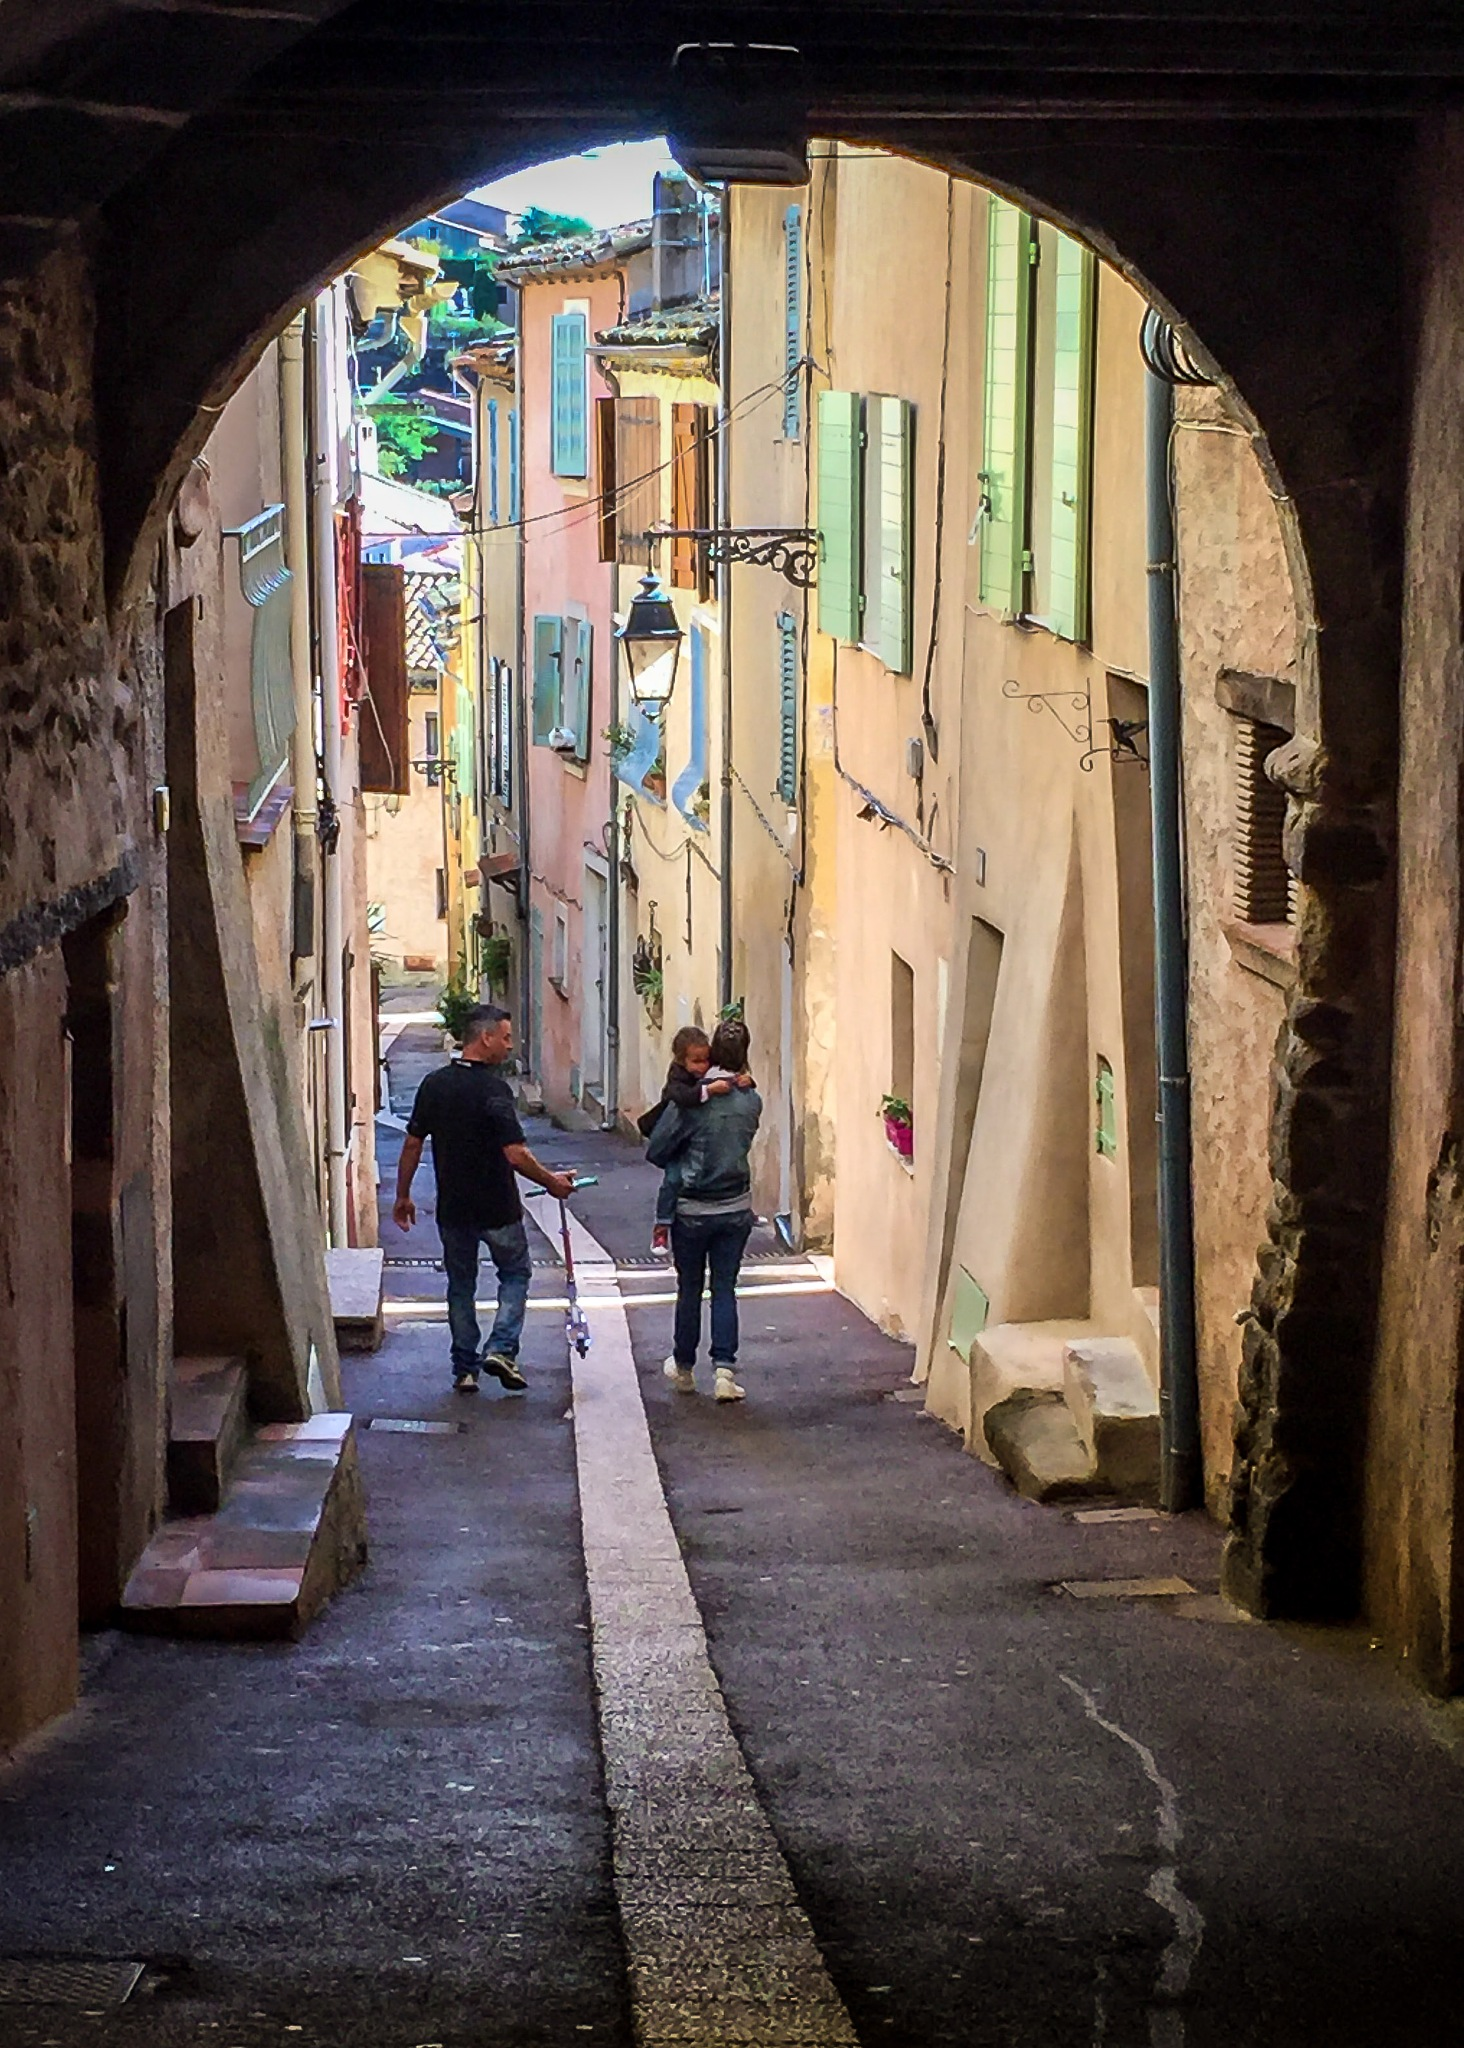 Street in Roquebrune-sur-Argens by Peter McCormack